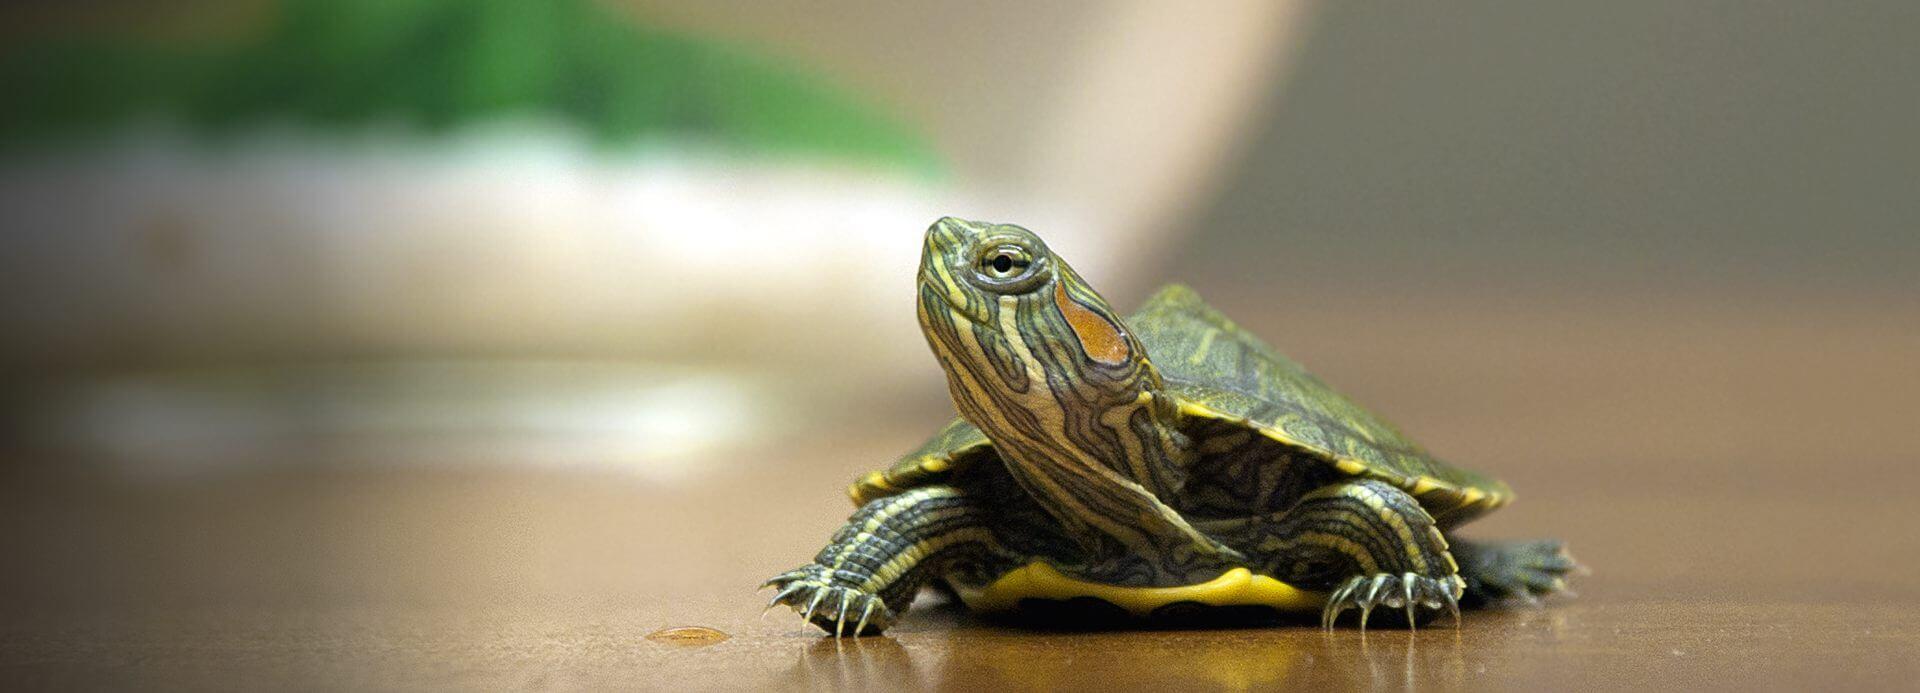 Amazon.com: Reptiles & Amphibians: Pet Supplies: Food, Terrarium Heat